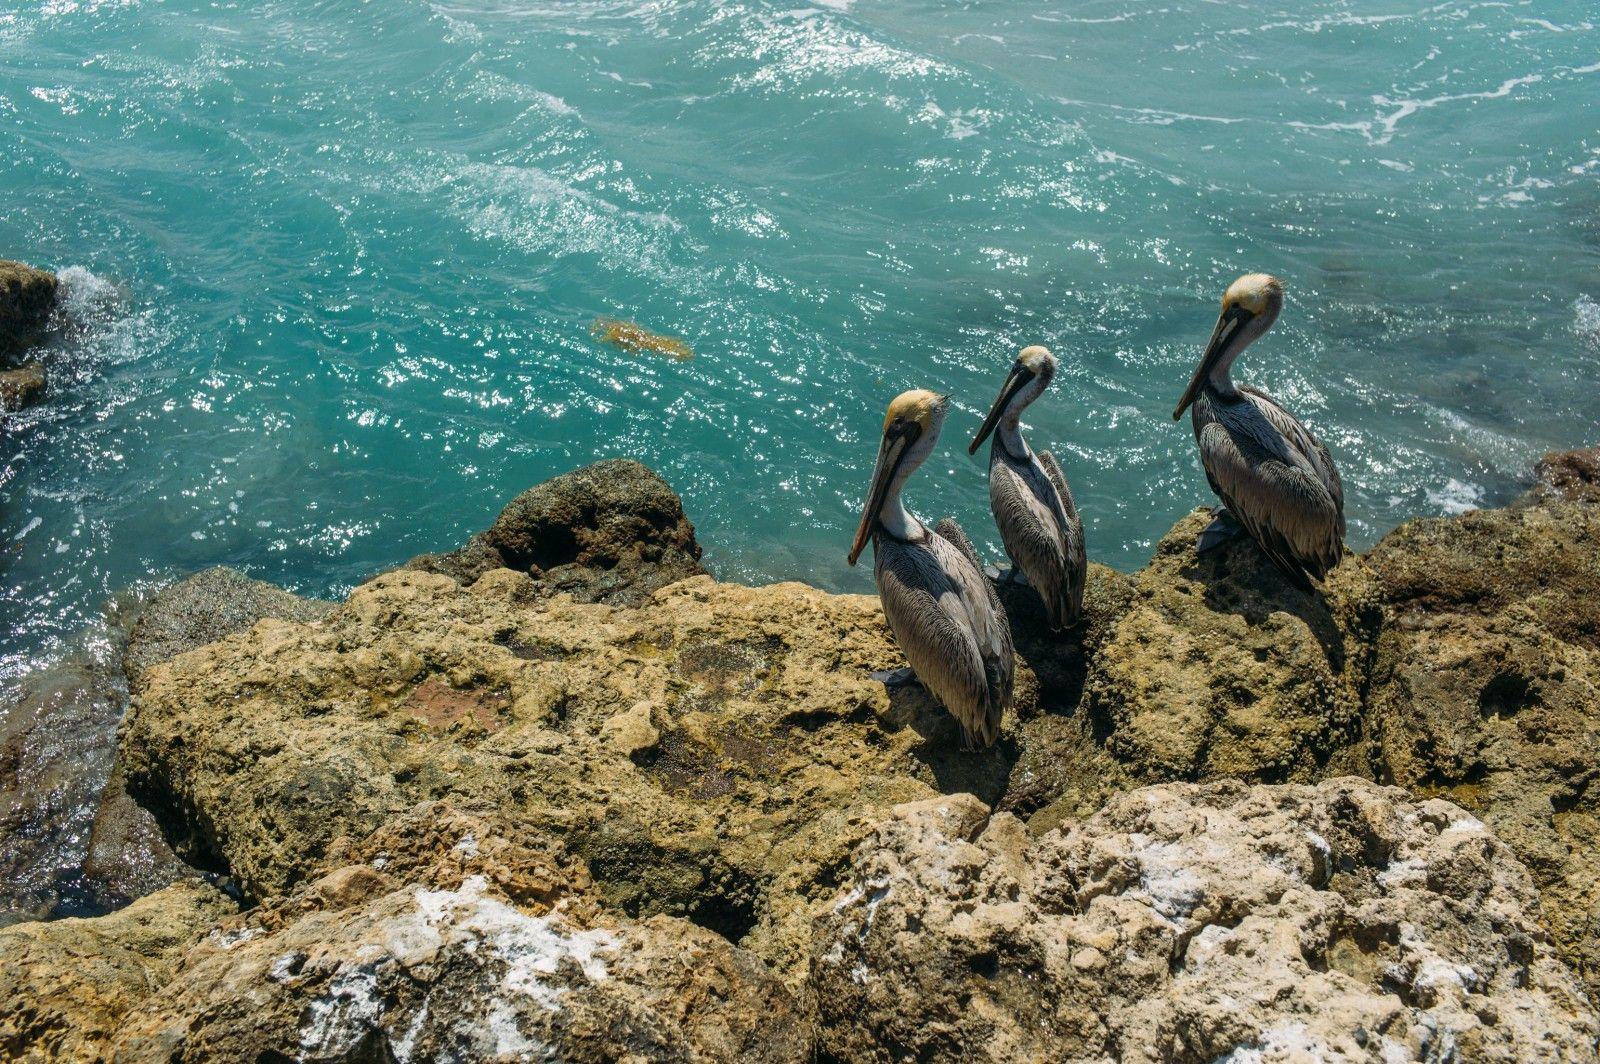 pelican_florida_usa_leica_m9p_35mm_summicron_jipvankuijk